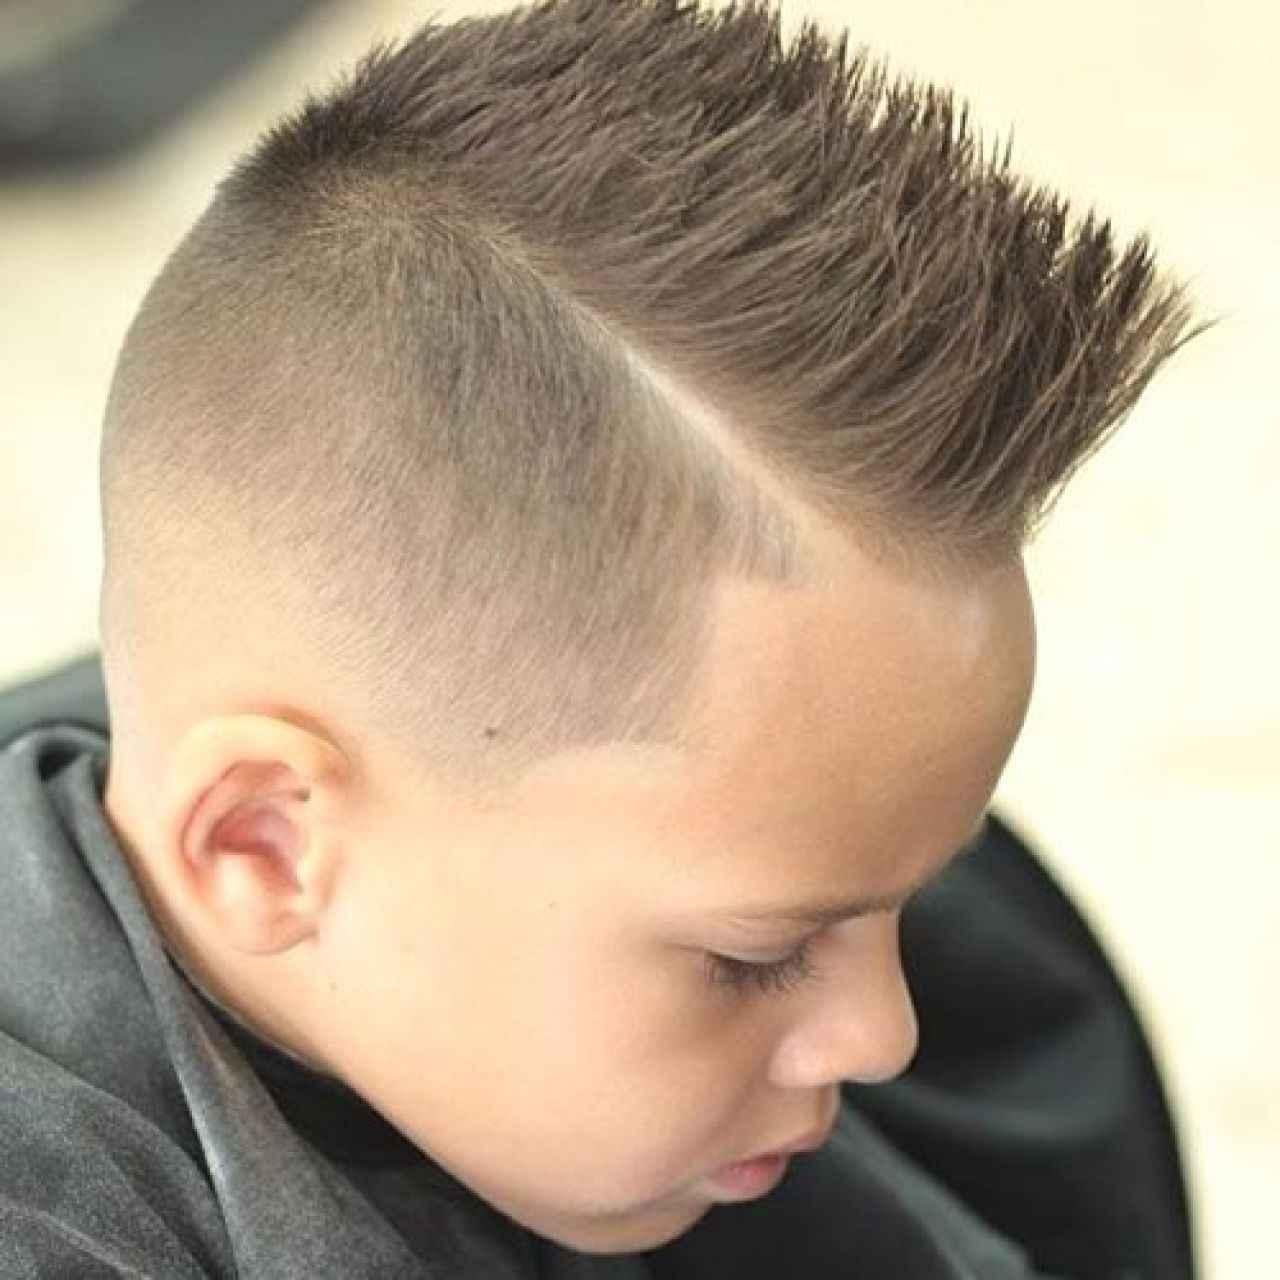 20. Hard Part Spiky Hair